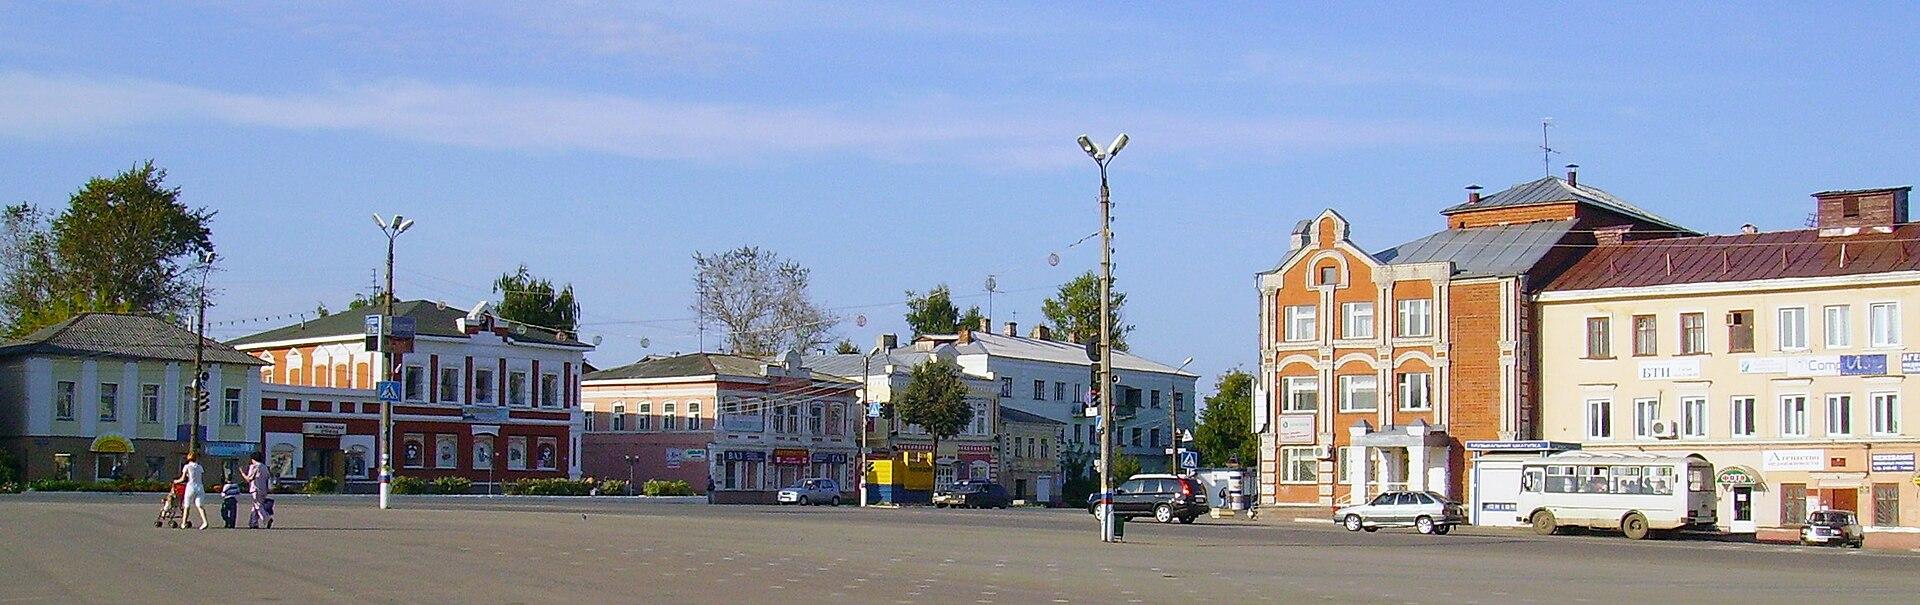 wikifoto